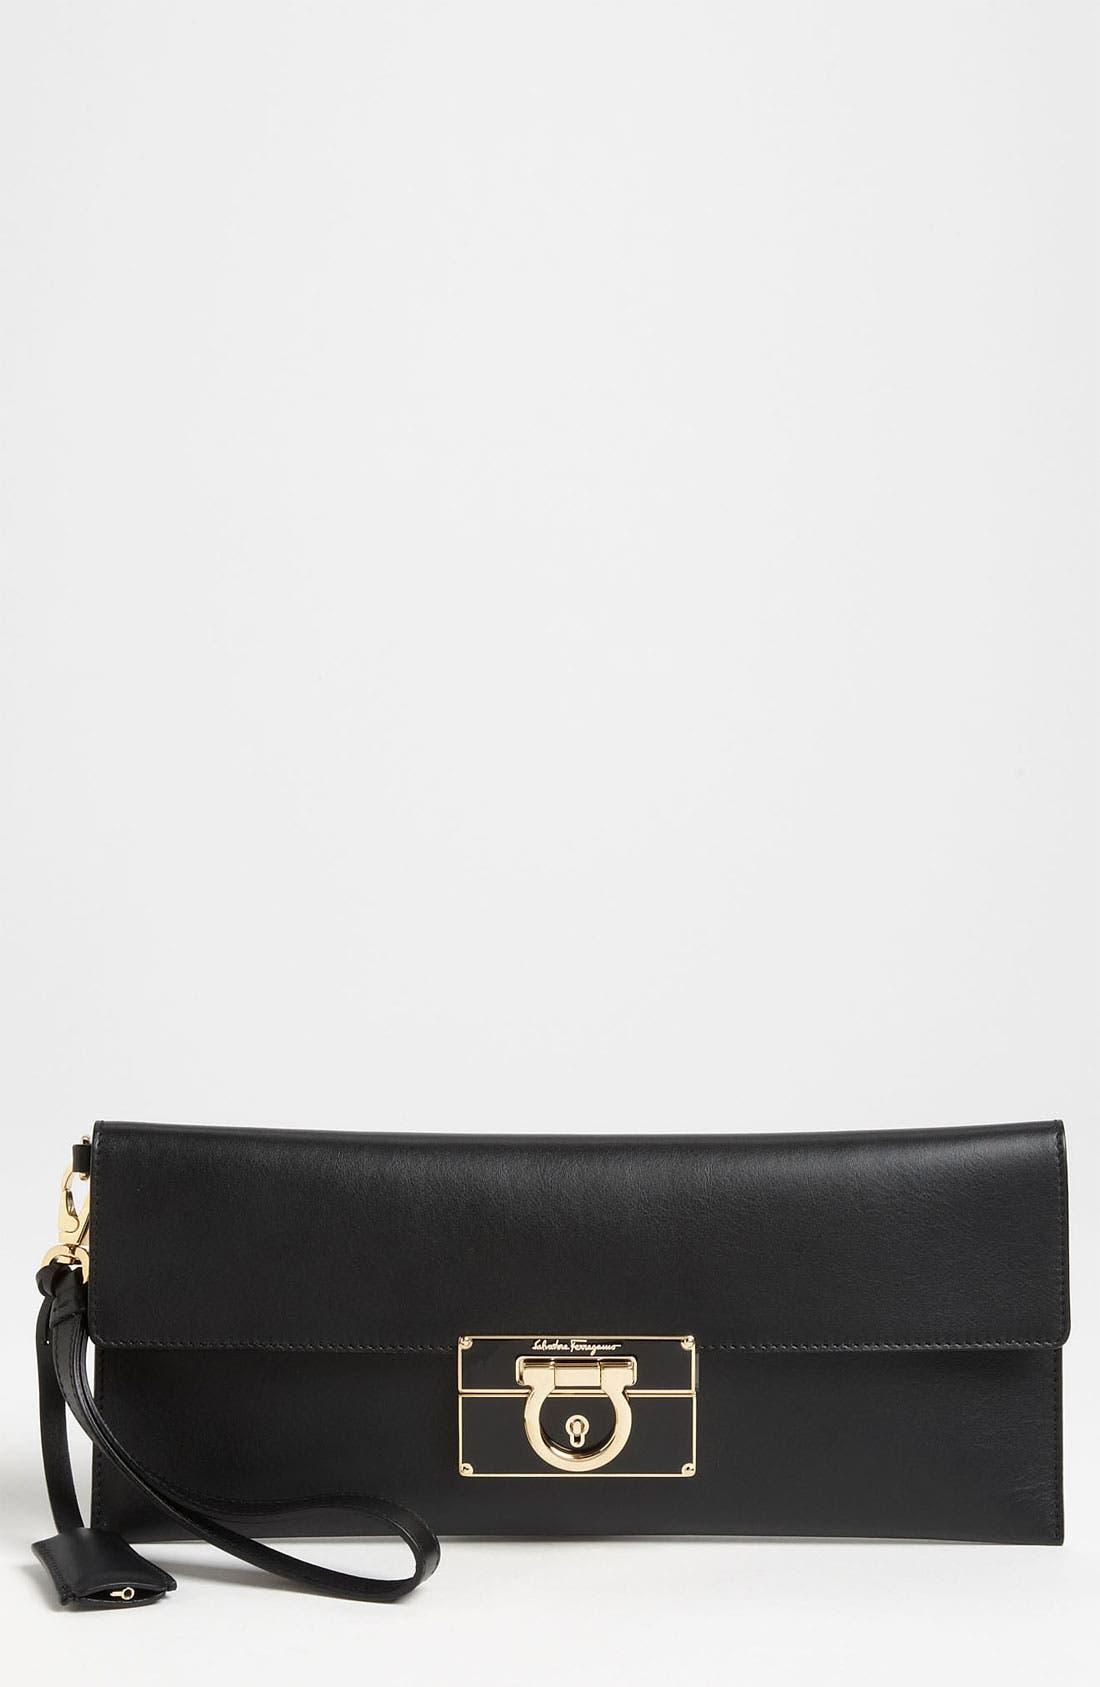 Alternate Image 1 Selected - Salvatore Ferragamo 'Afef' Leather Envelope Clutch